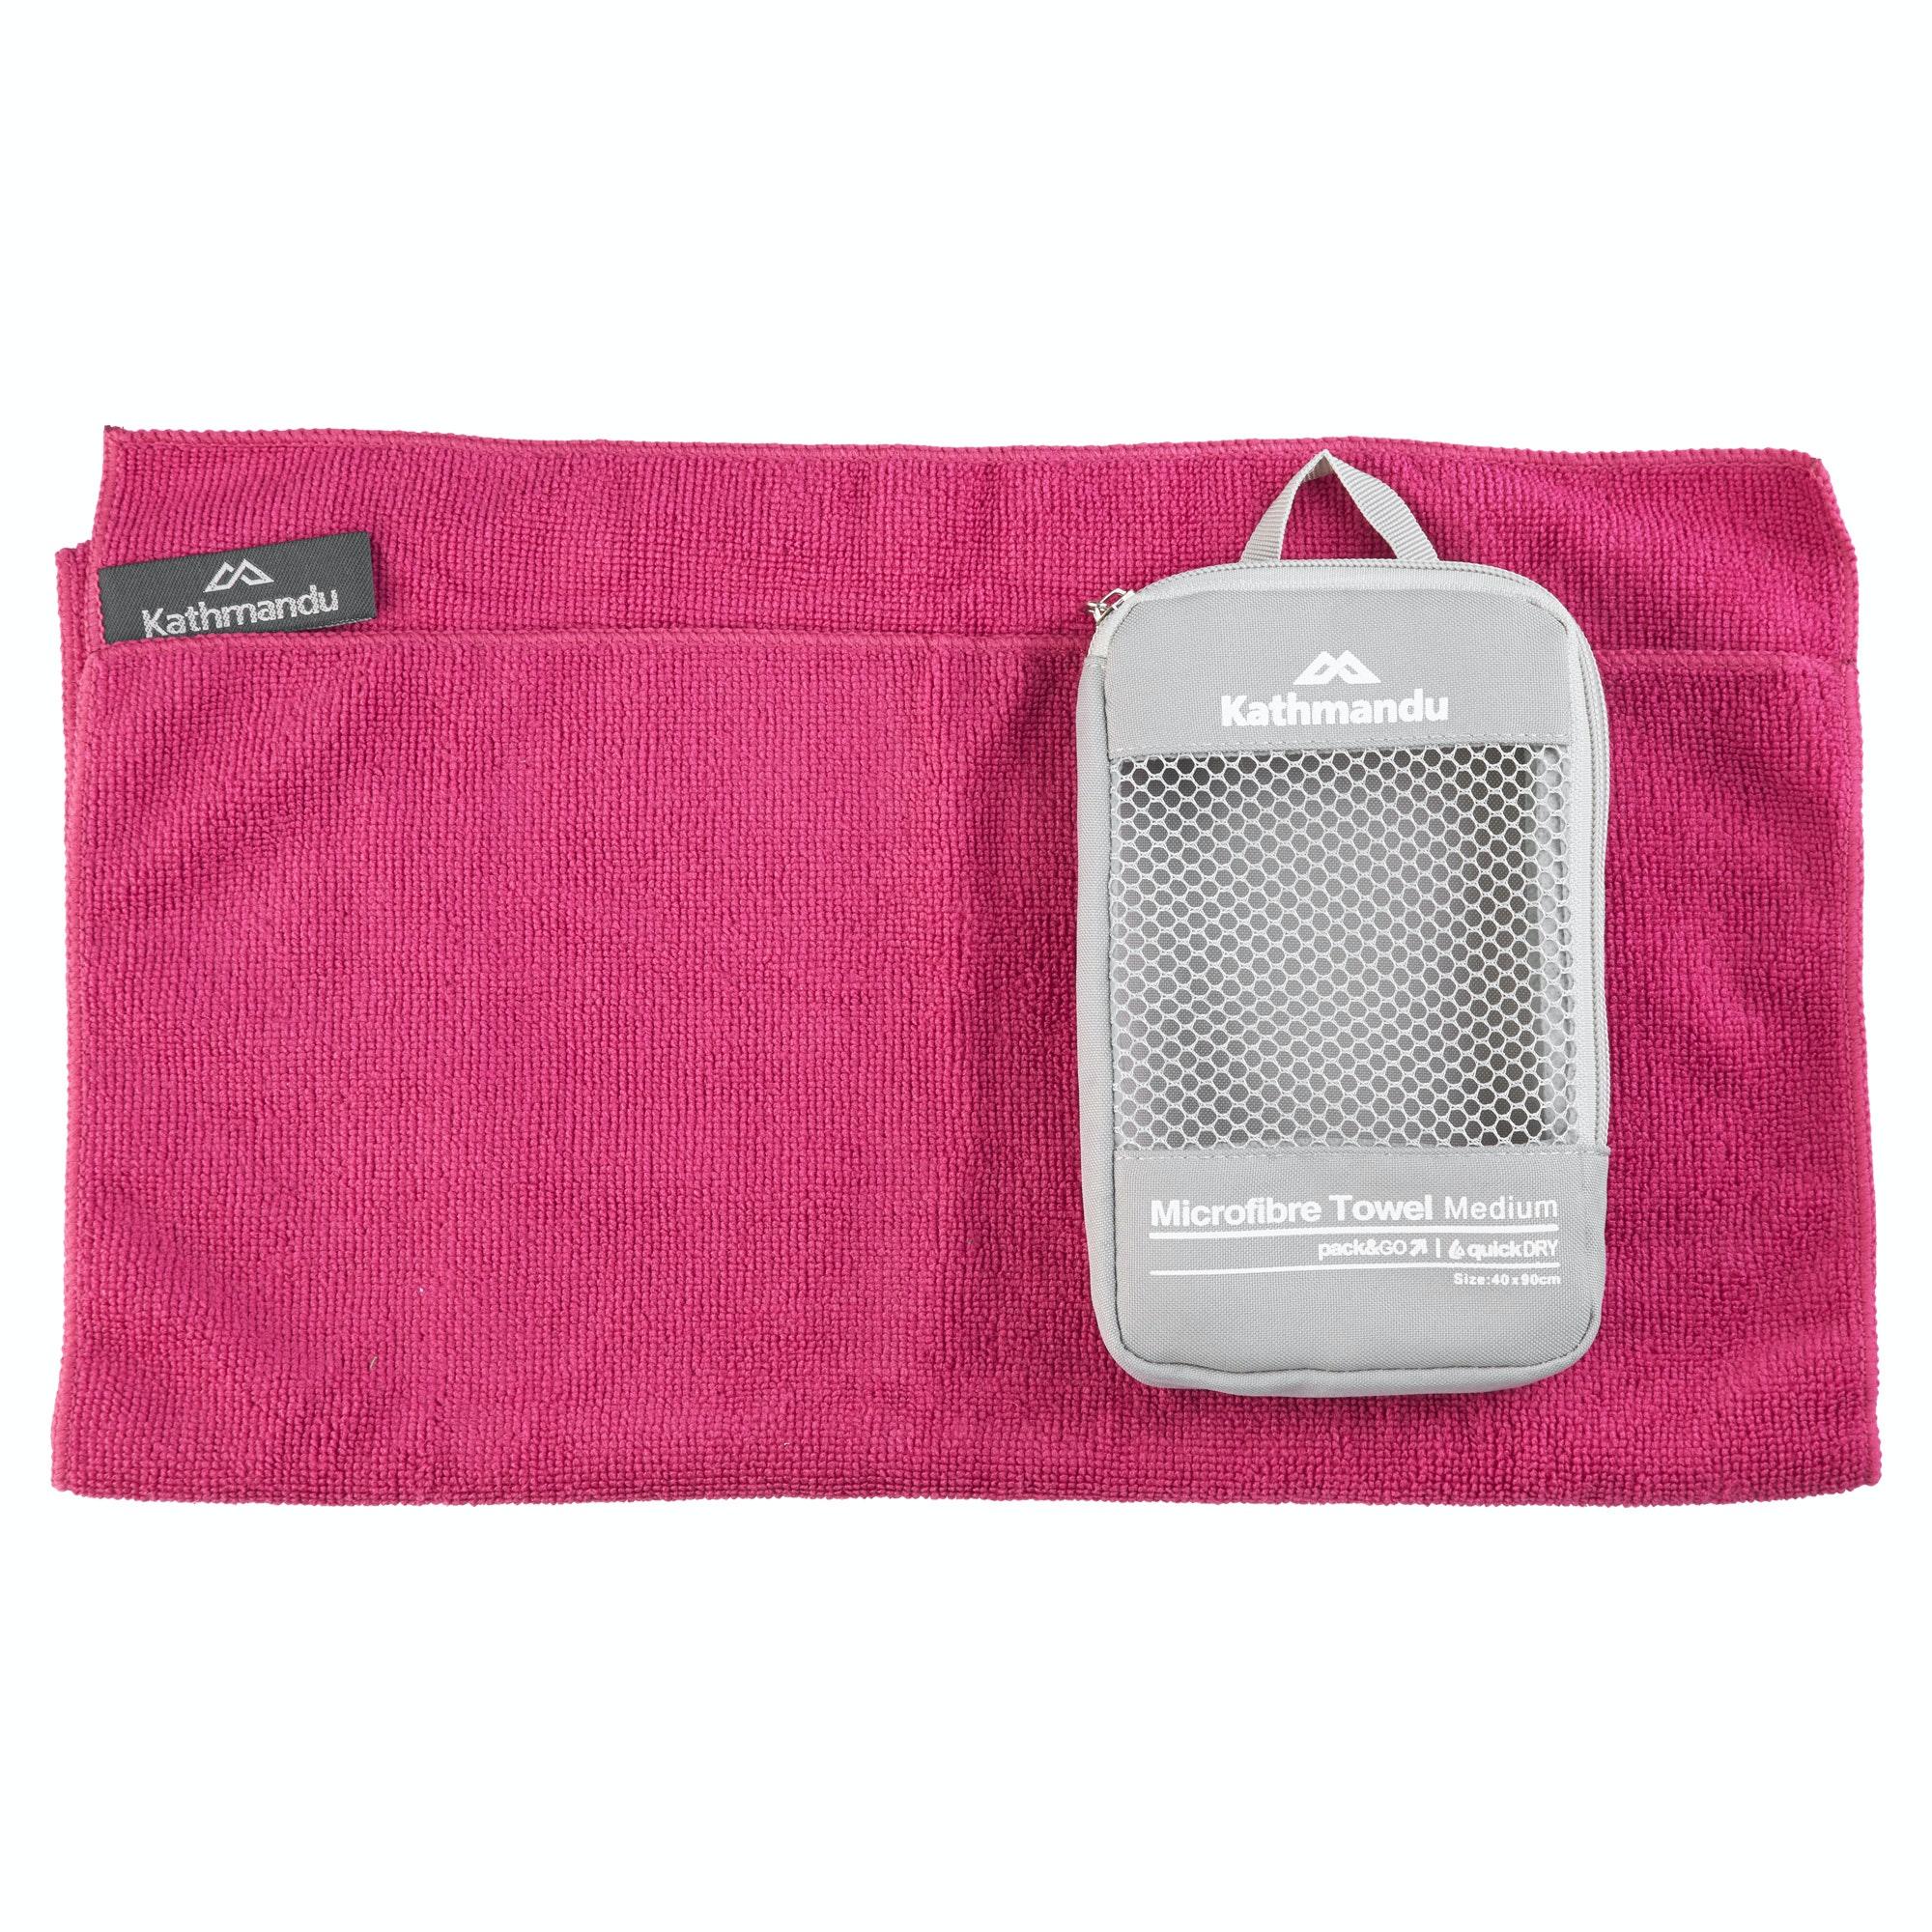 Microfiber Gym Towel With Zip: Kathmandu Microfibre Quick Dry Medium Gym Sport Travel